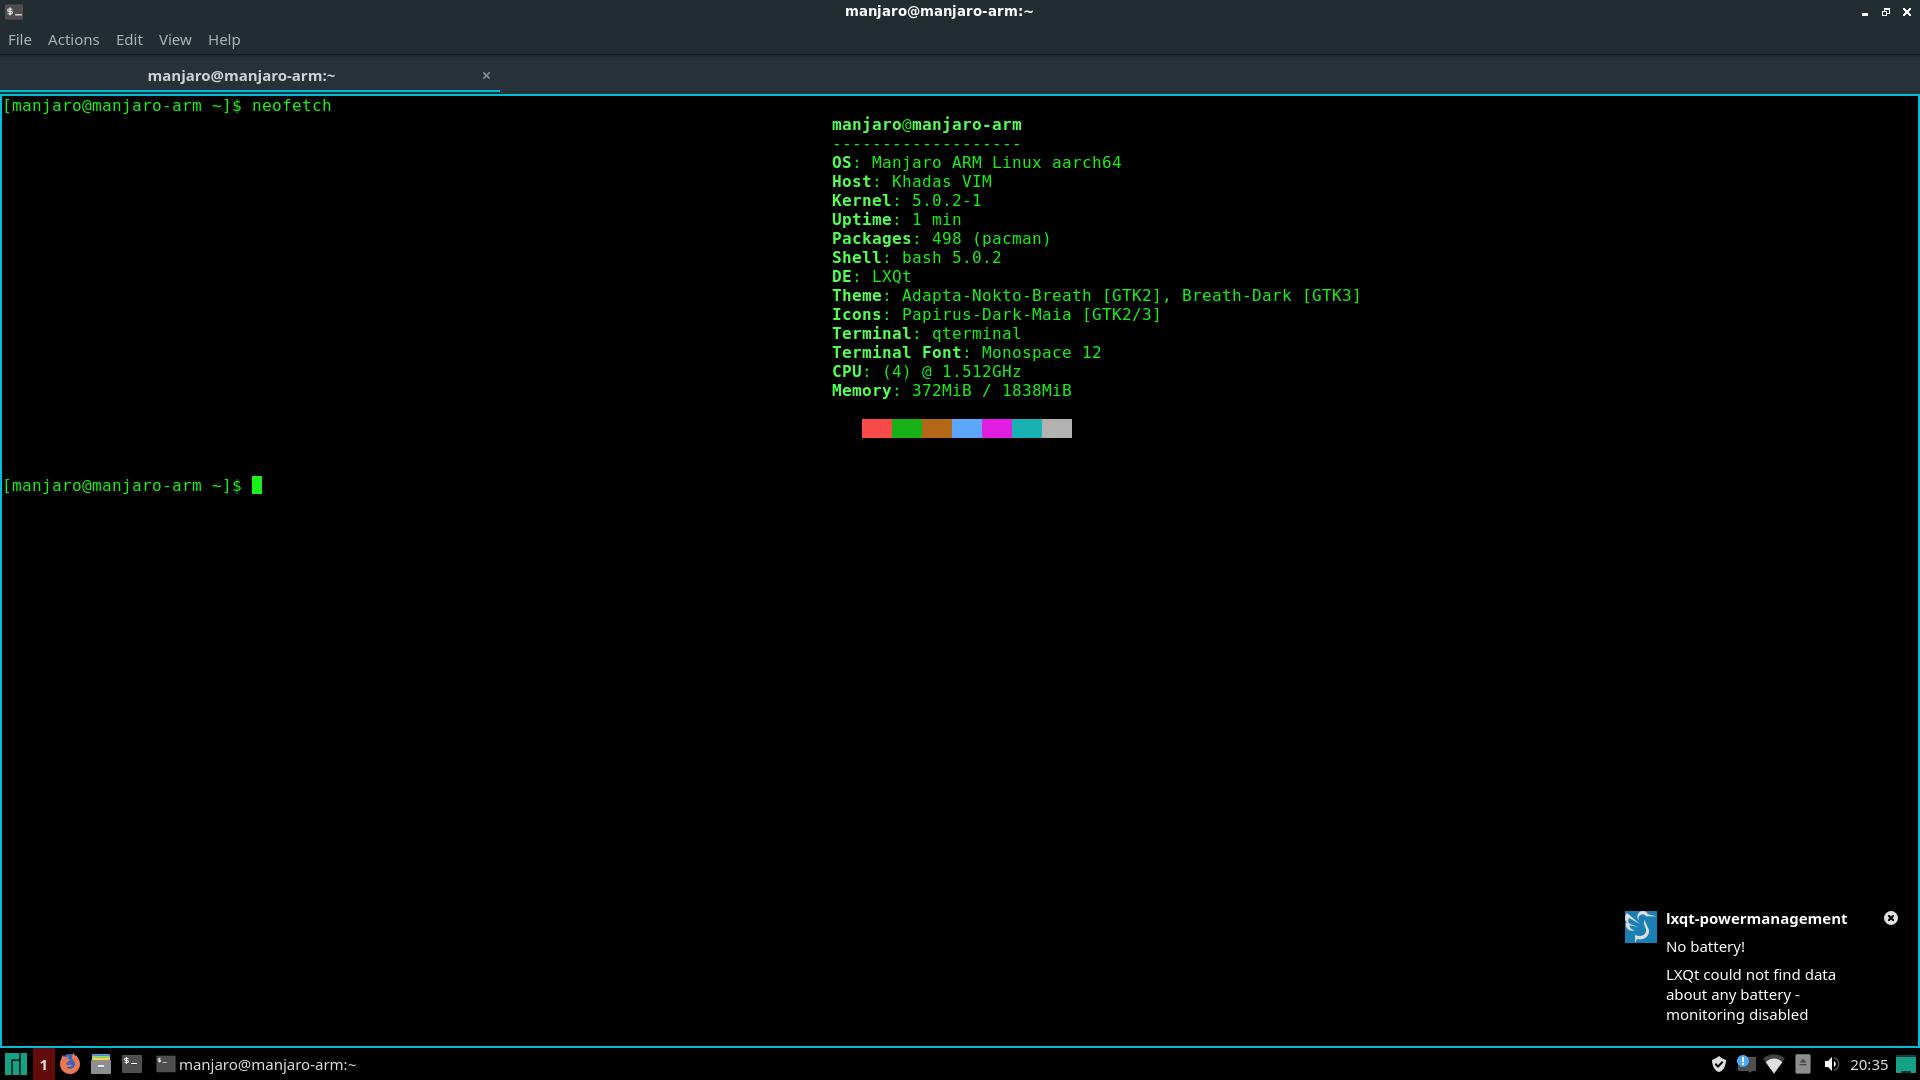 Manjaro Linux - Desktop Environment for VIM1 & VIM3 - VIM1